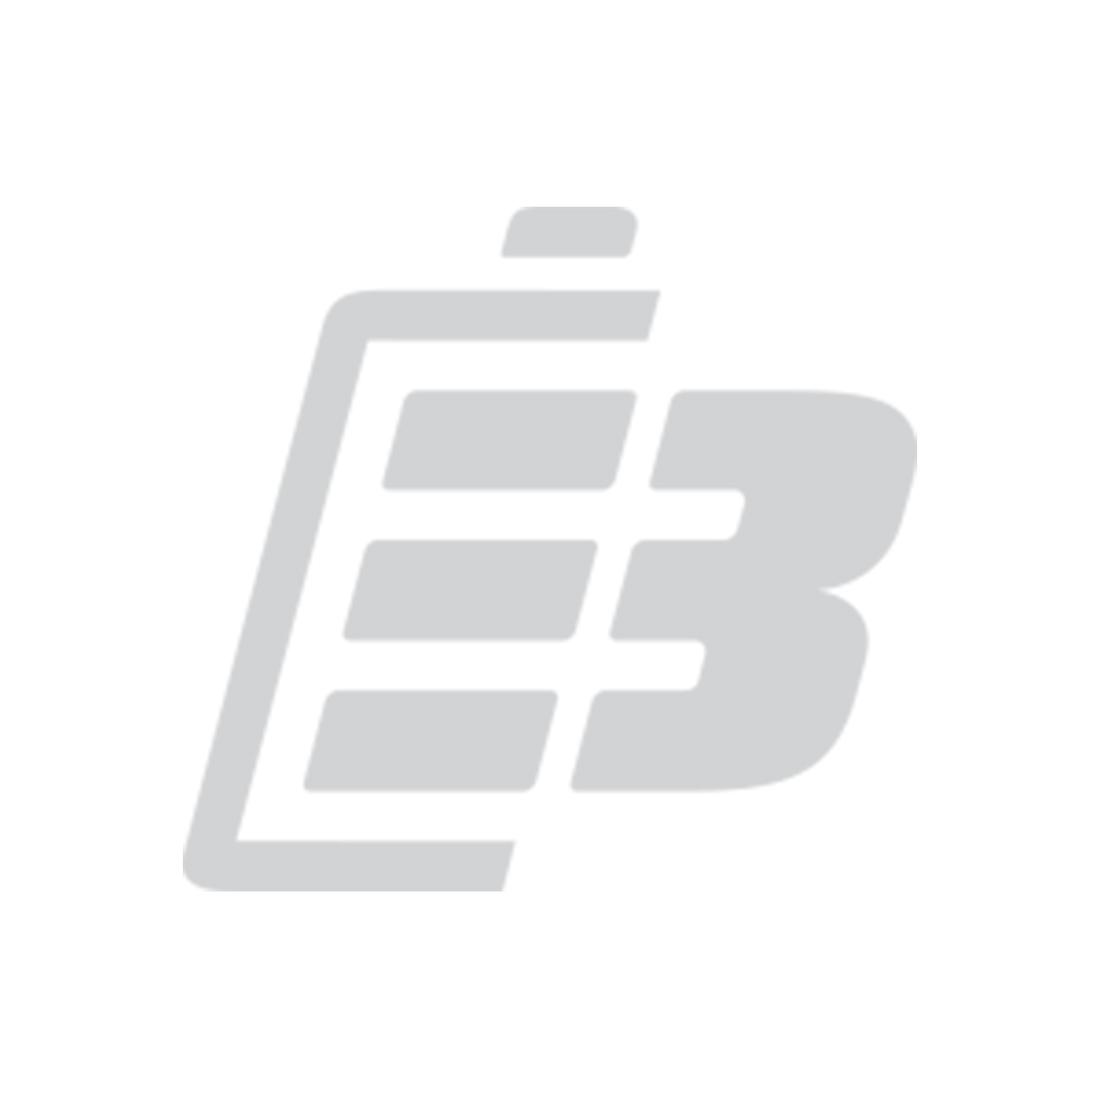 Printer battery Datamax-O'Neil Microflash 4T_1